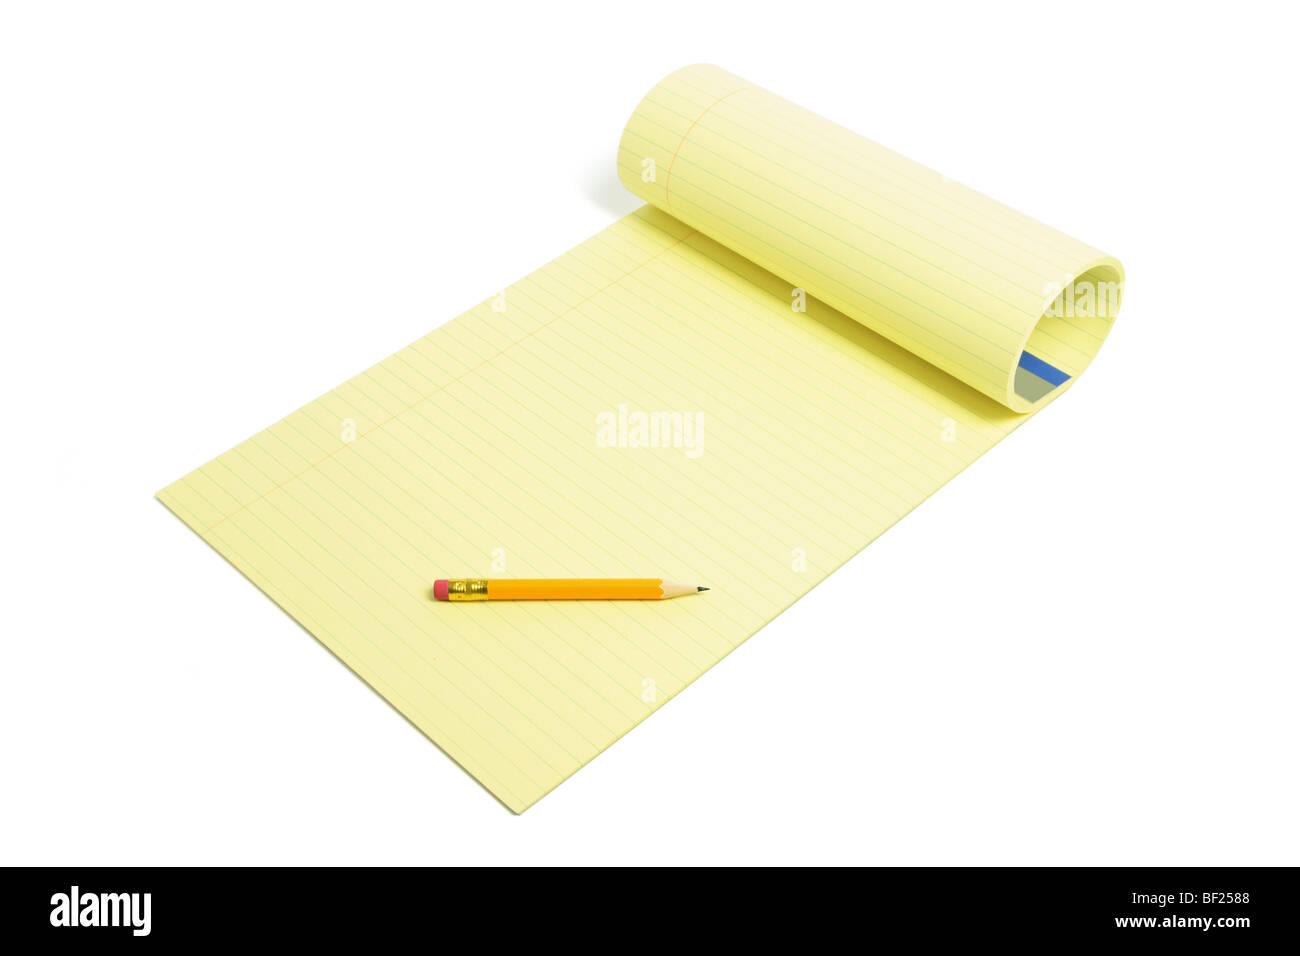 Pencil and Writing Pad - Stock Image